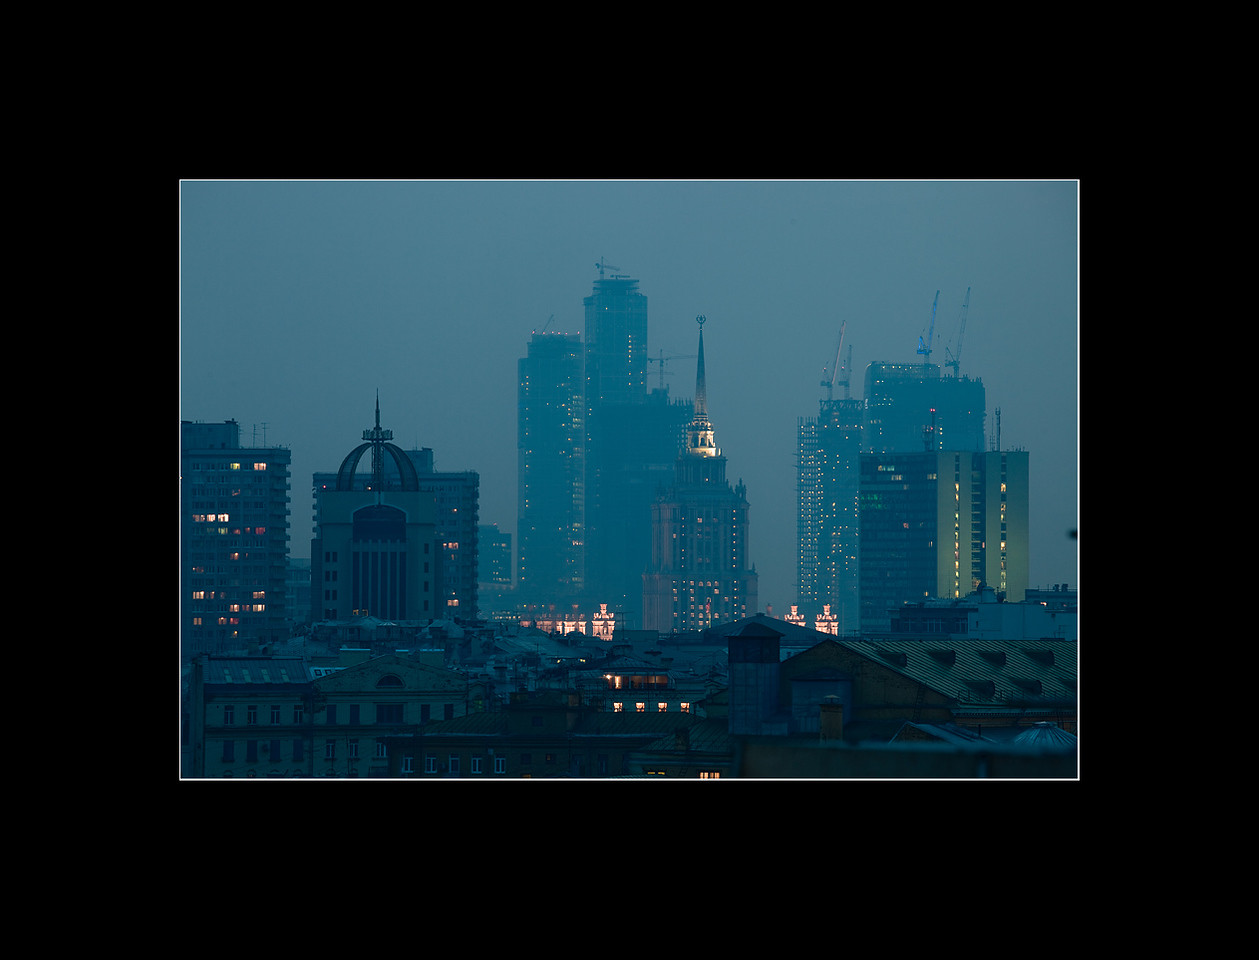 Moscow City development